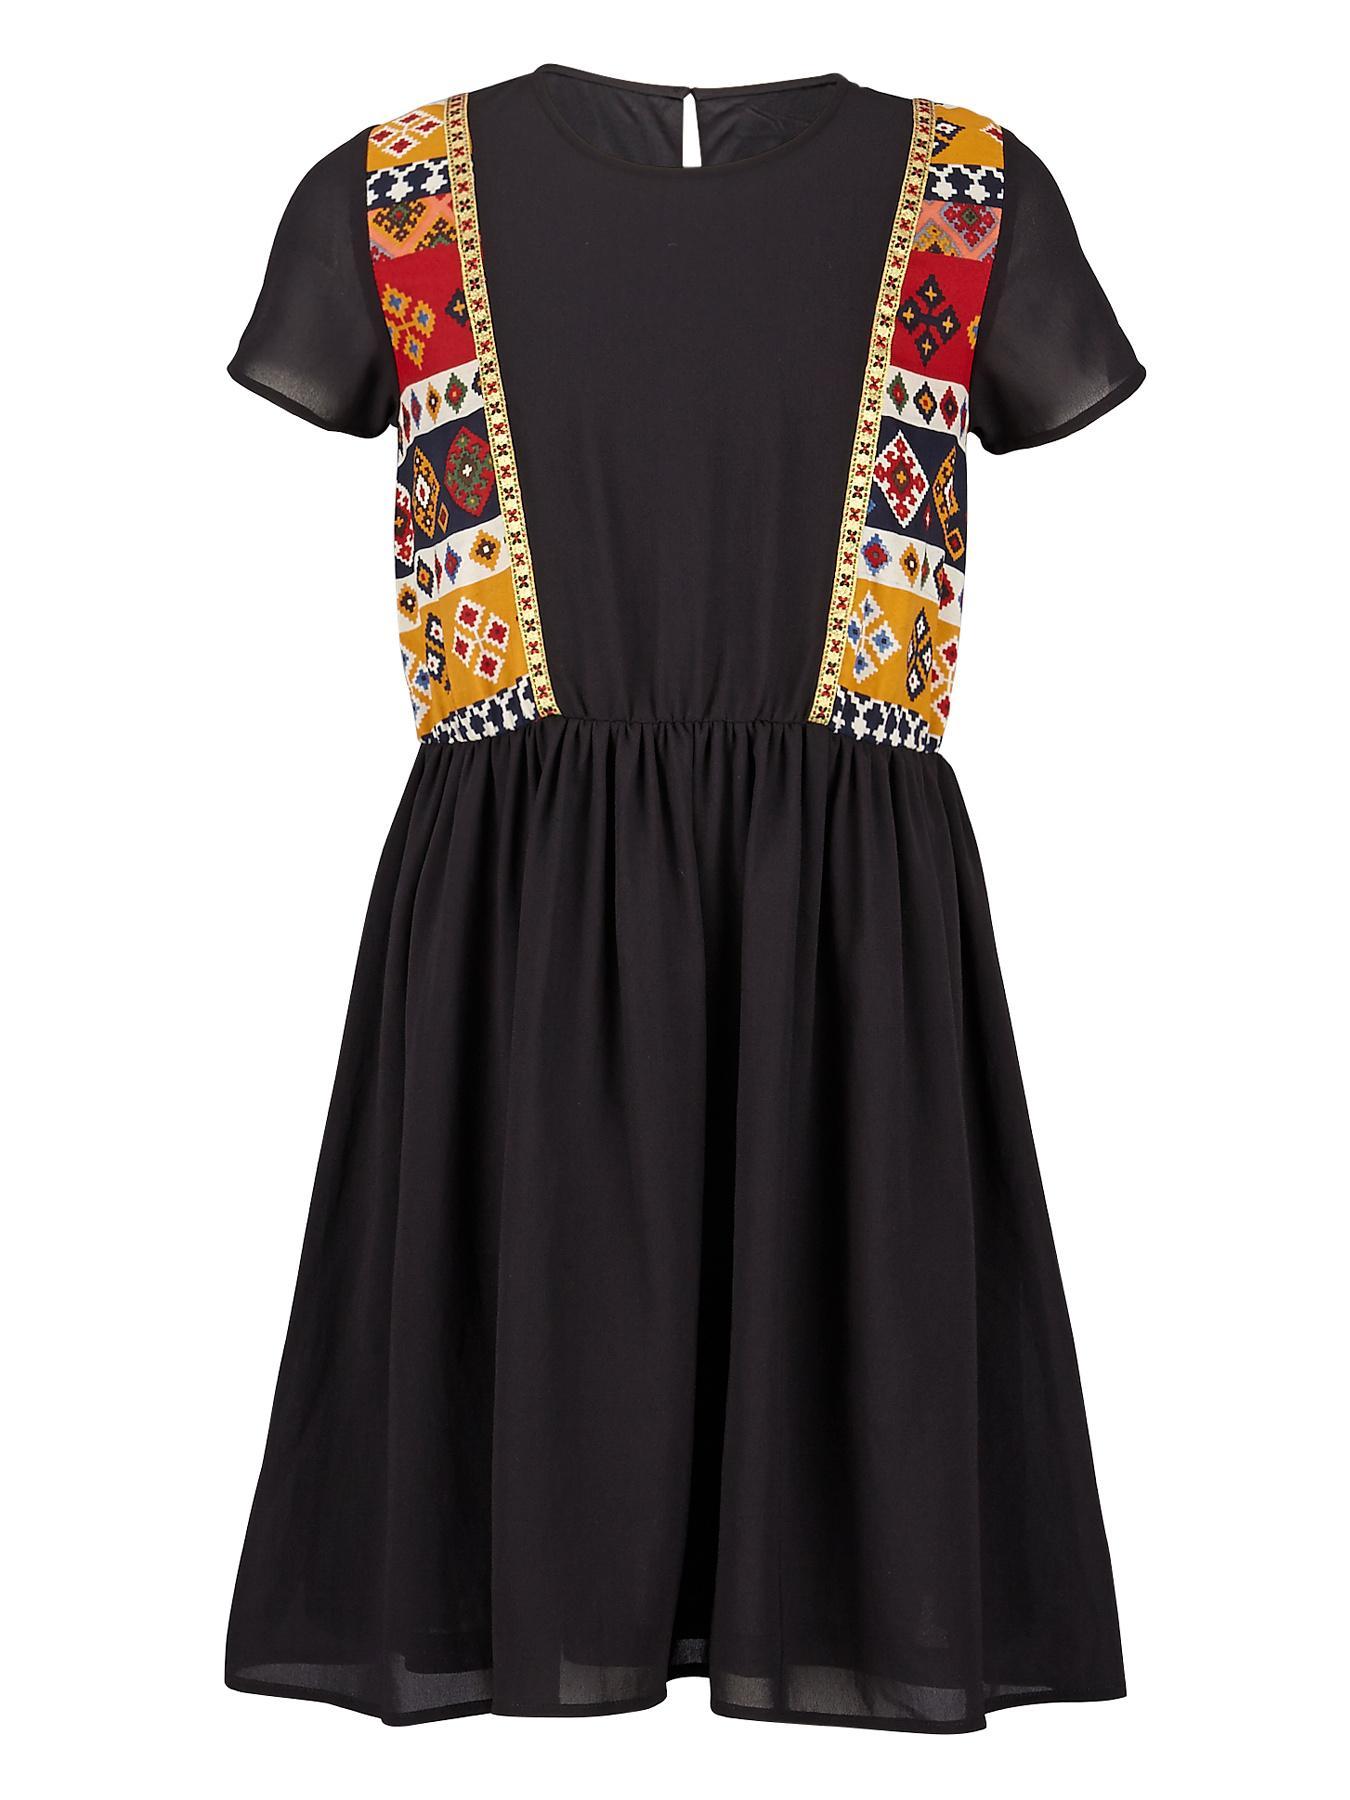 Freespirit Girls Folklore Embroidered Dress - Black, Black